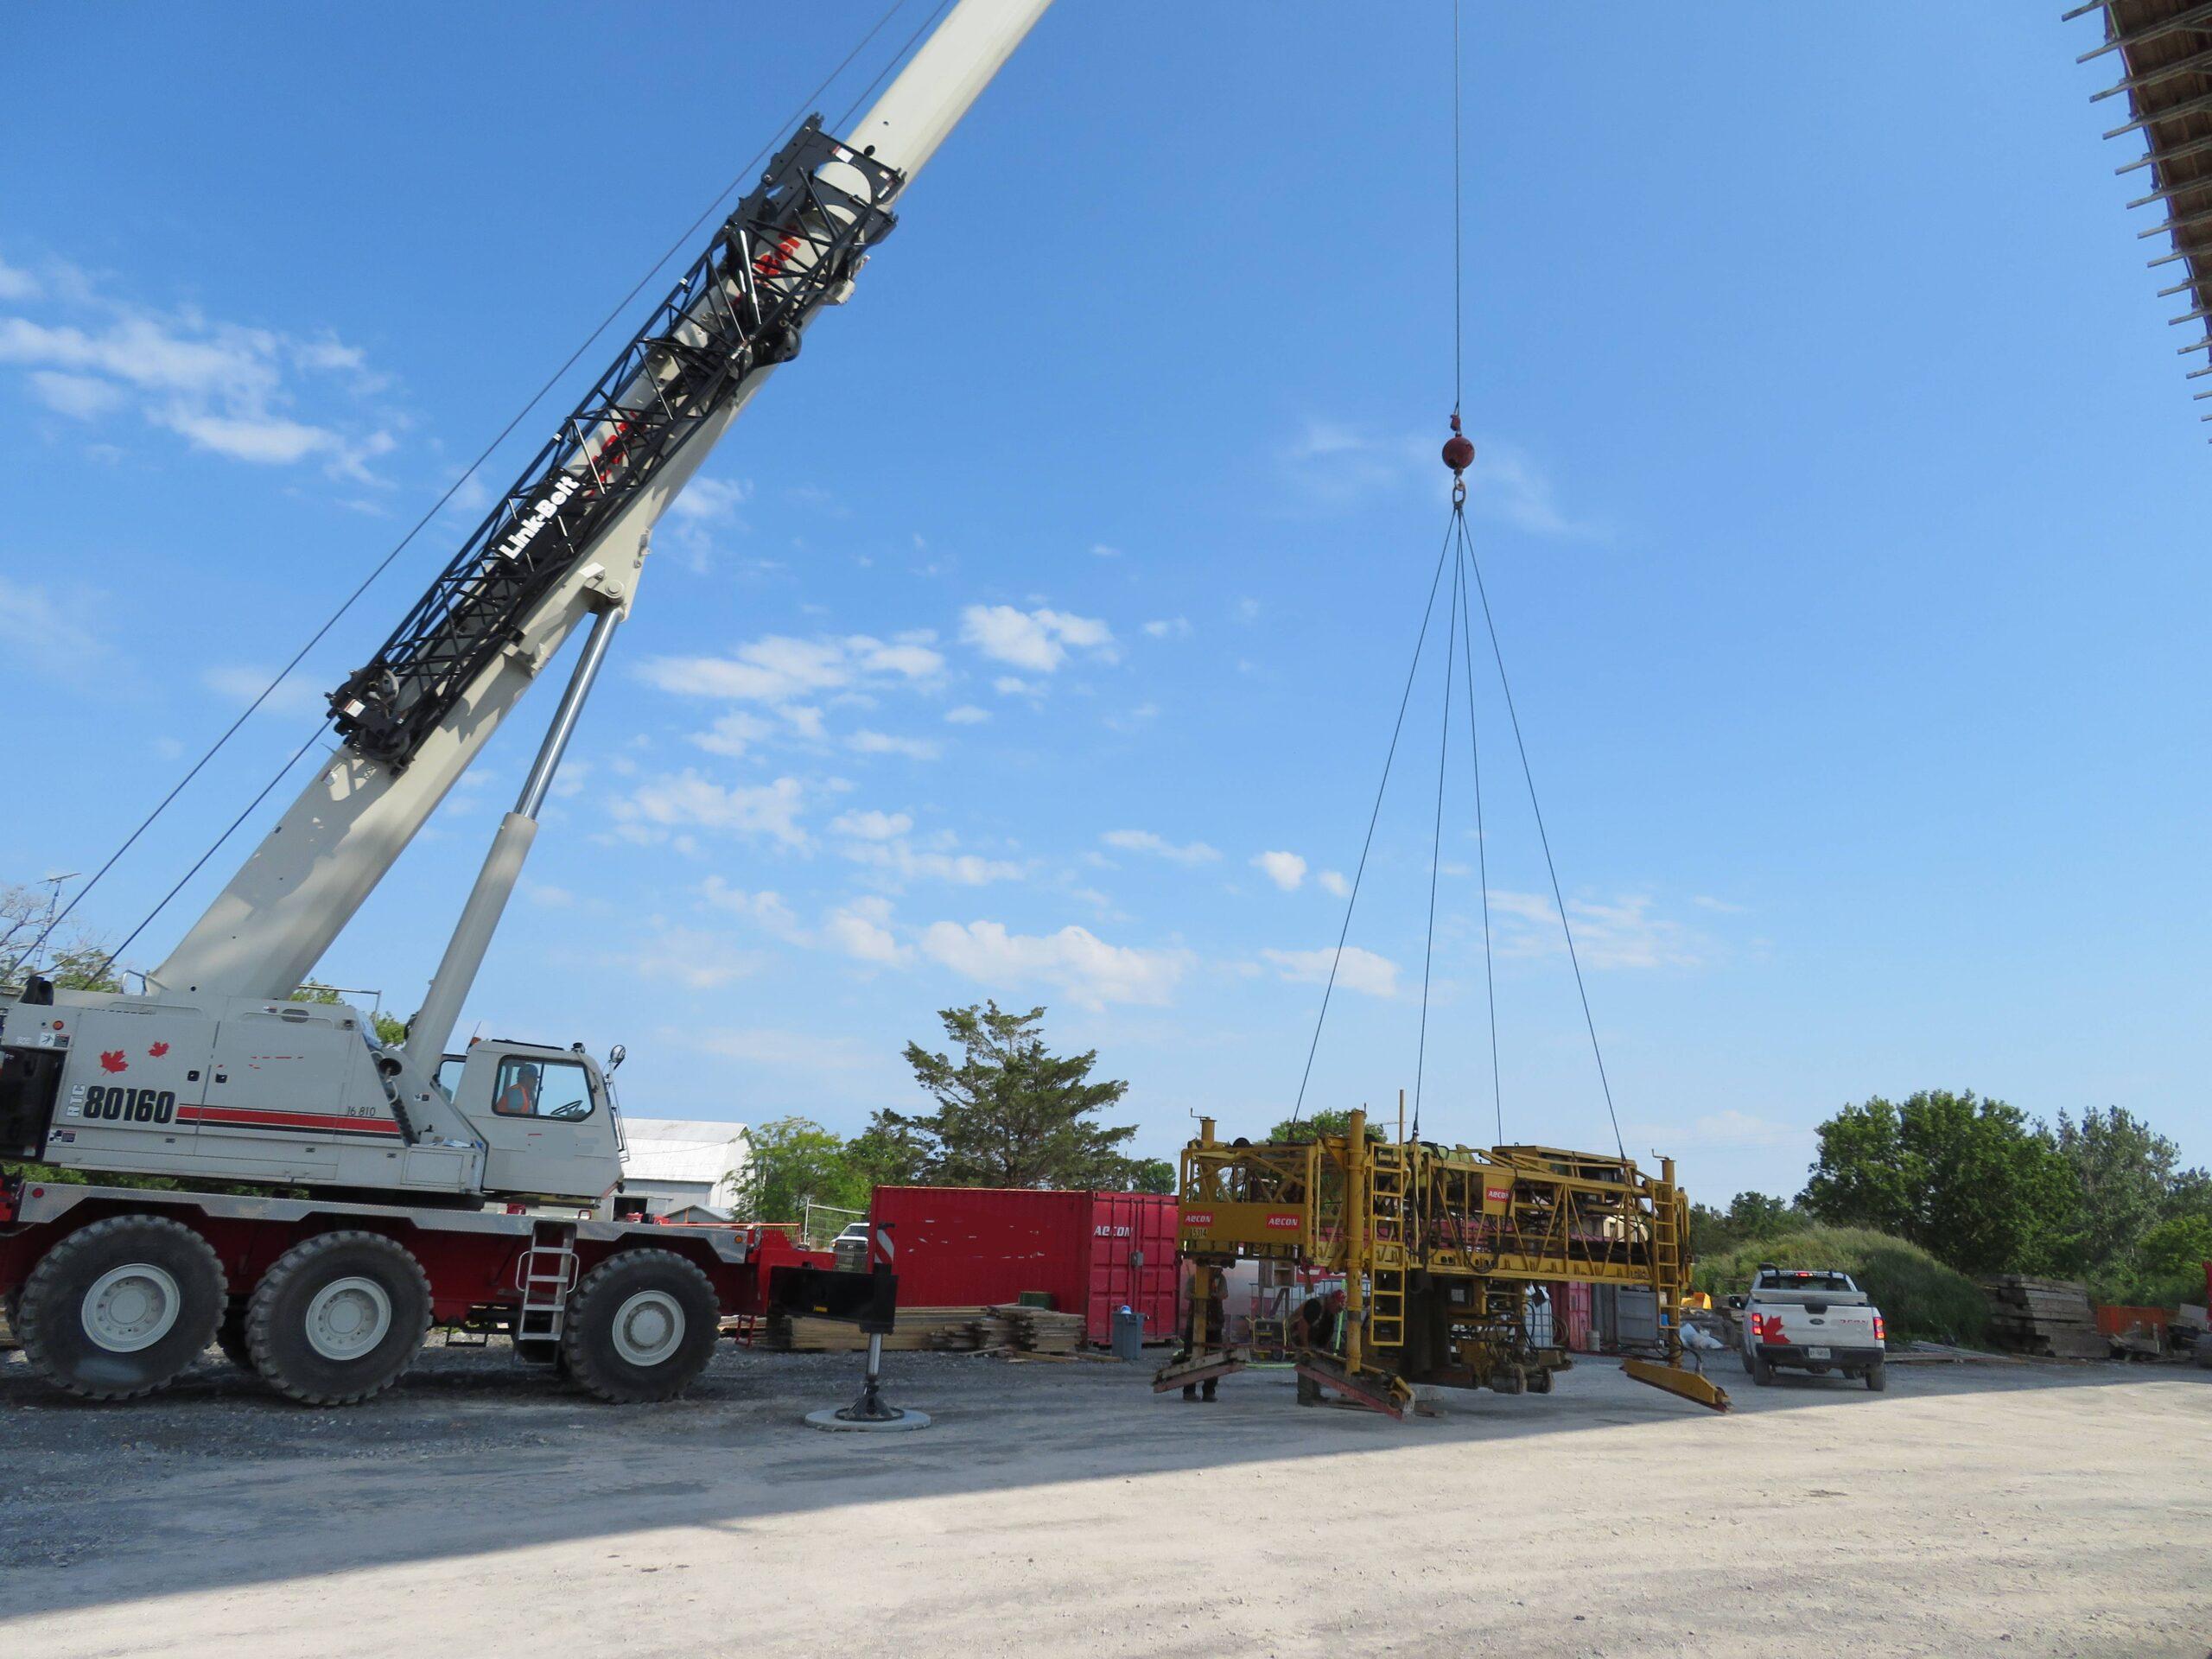 160-ton crane moving the concrete finisher